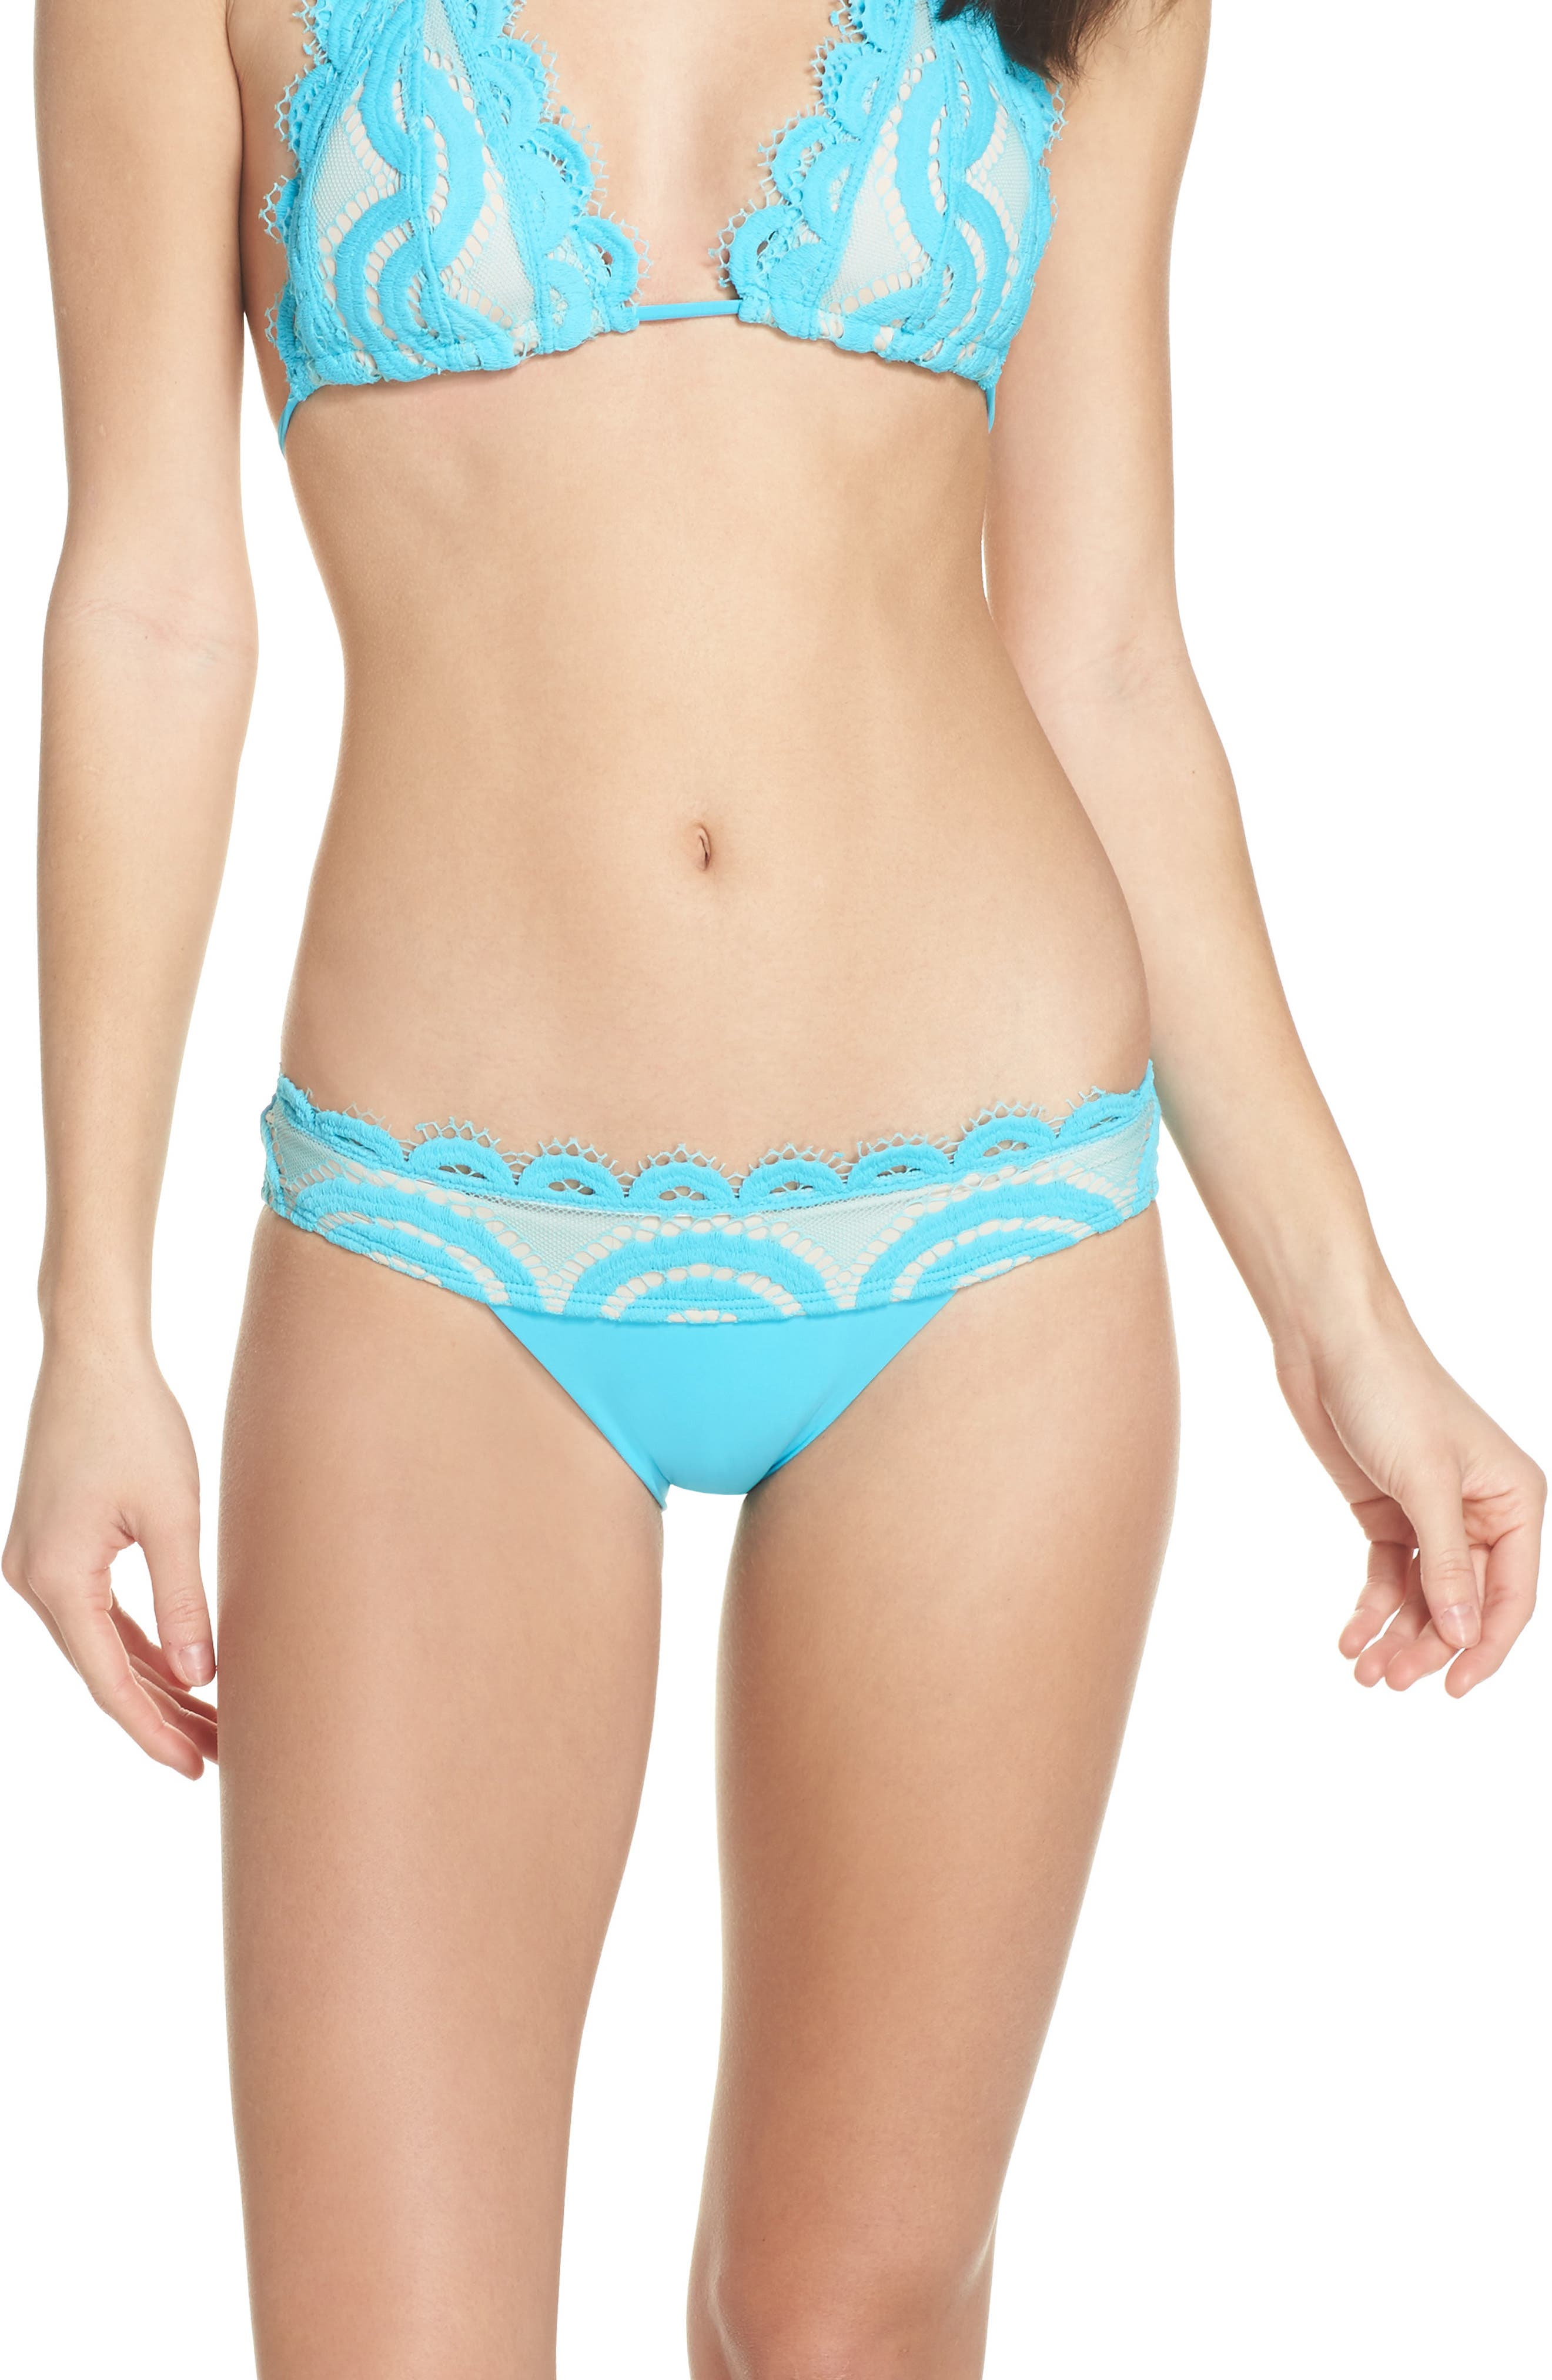 Banded Lace Bikini Bottoms,                         Main,                         color, 415